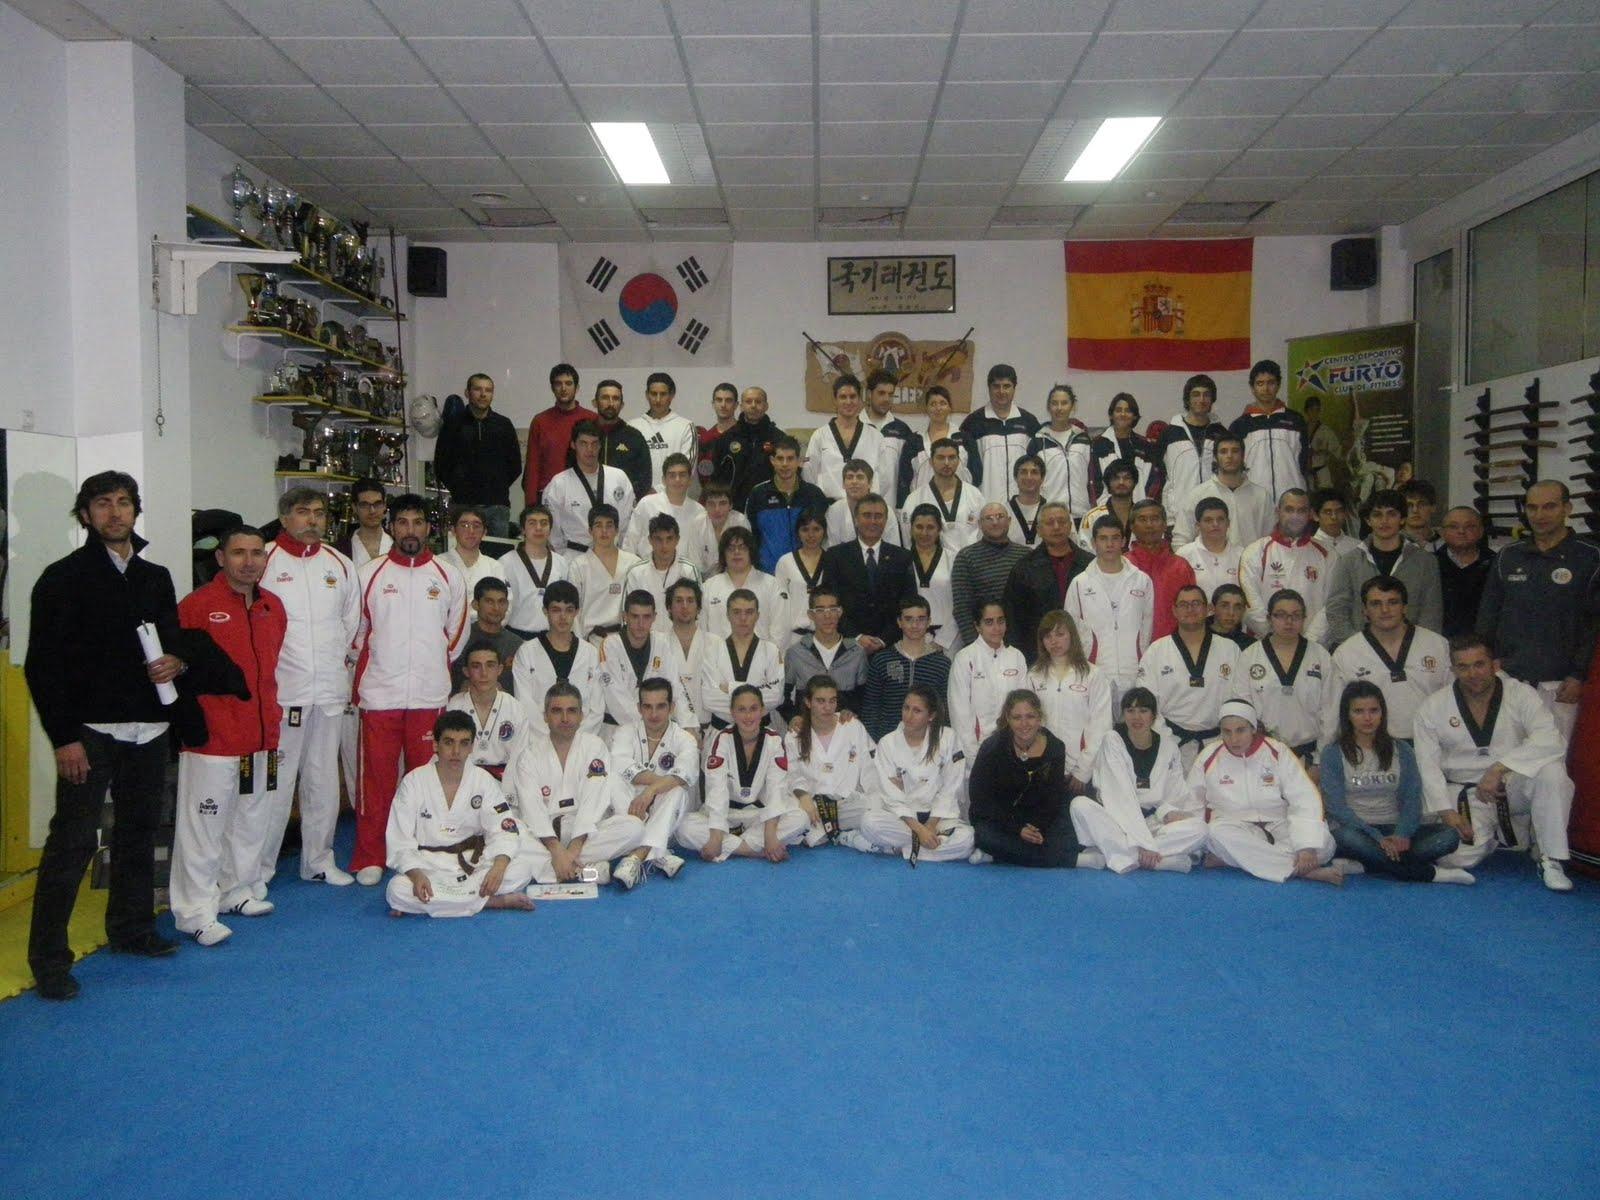 Club taekwondo la safor gand a curso de arbitros for Curso mantenimiento de piscinas comunidad valenciana